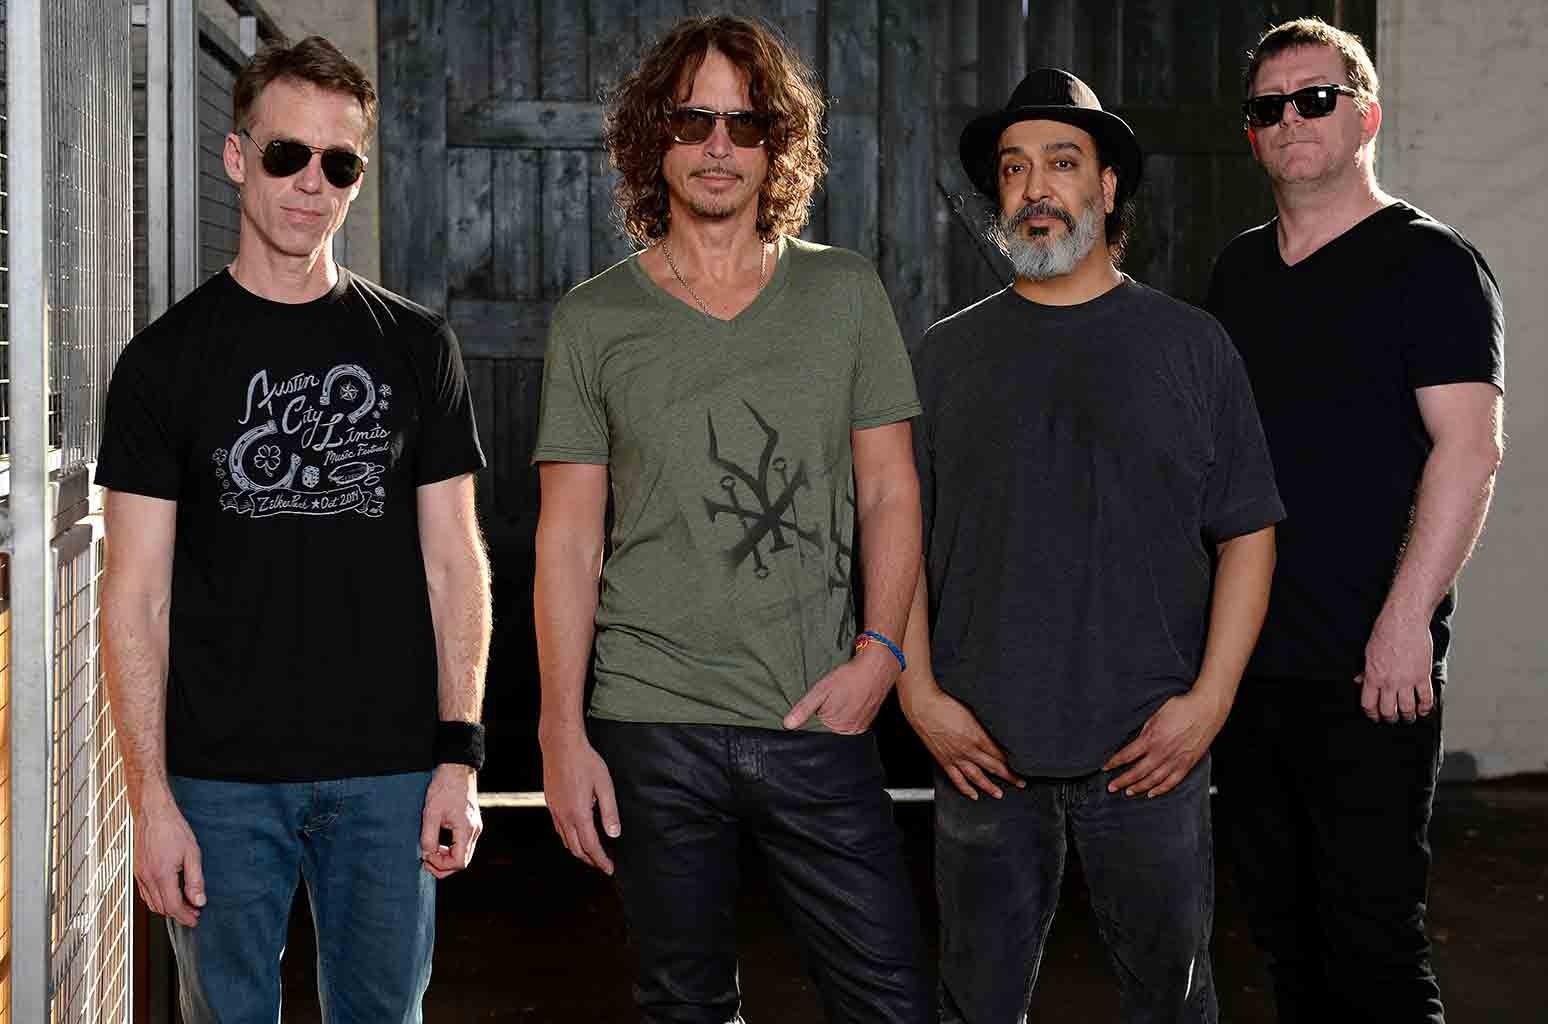 Soundgarden pose for portraits at the Soundwave Festival at Melbourne showgrounds on Feb. 22, 2015 in Melbourne, Australia.